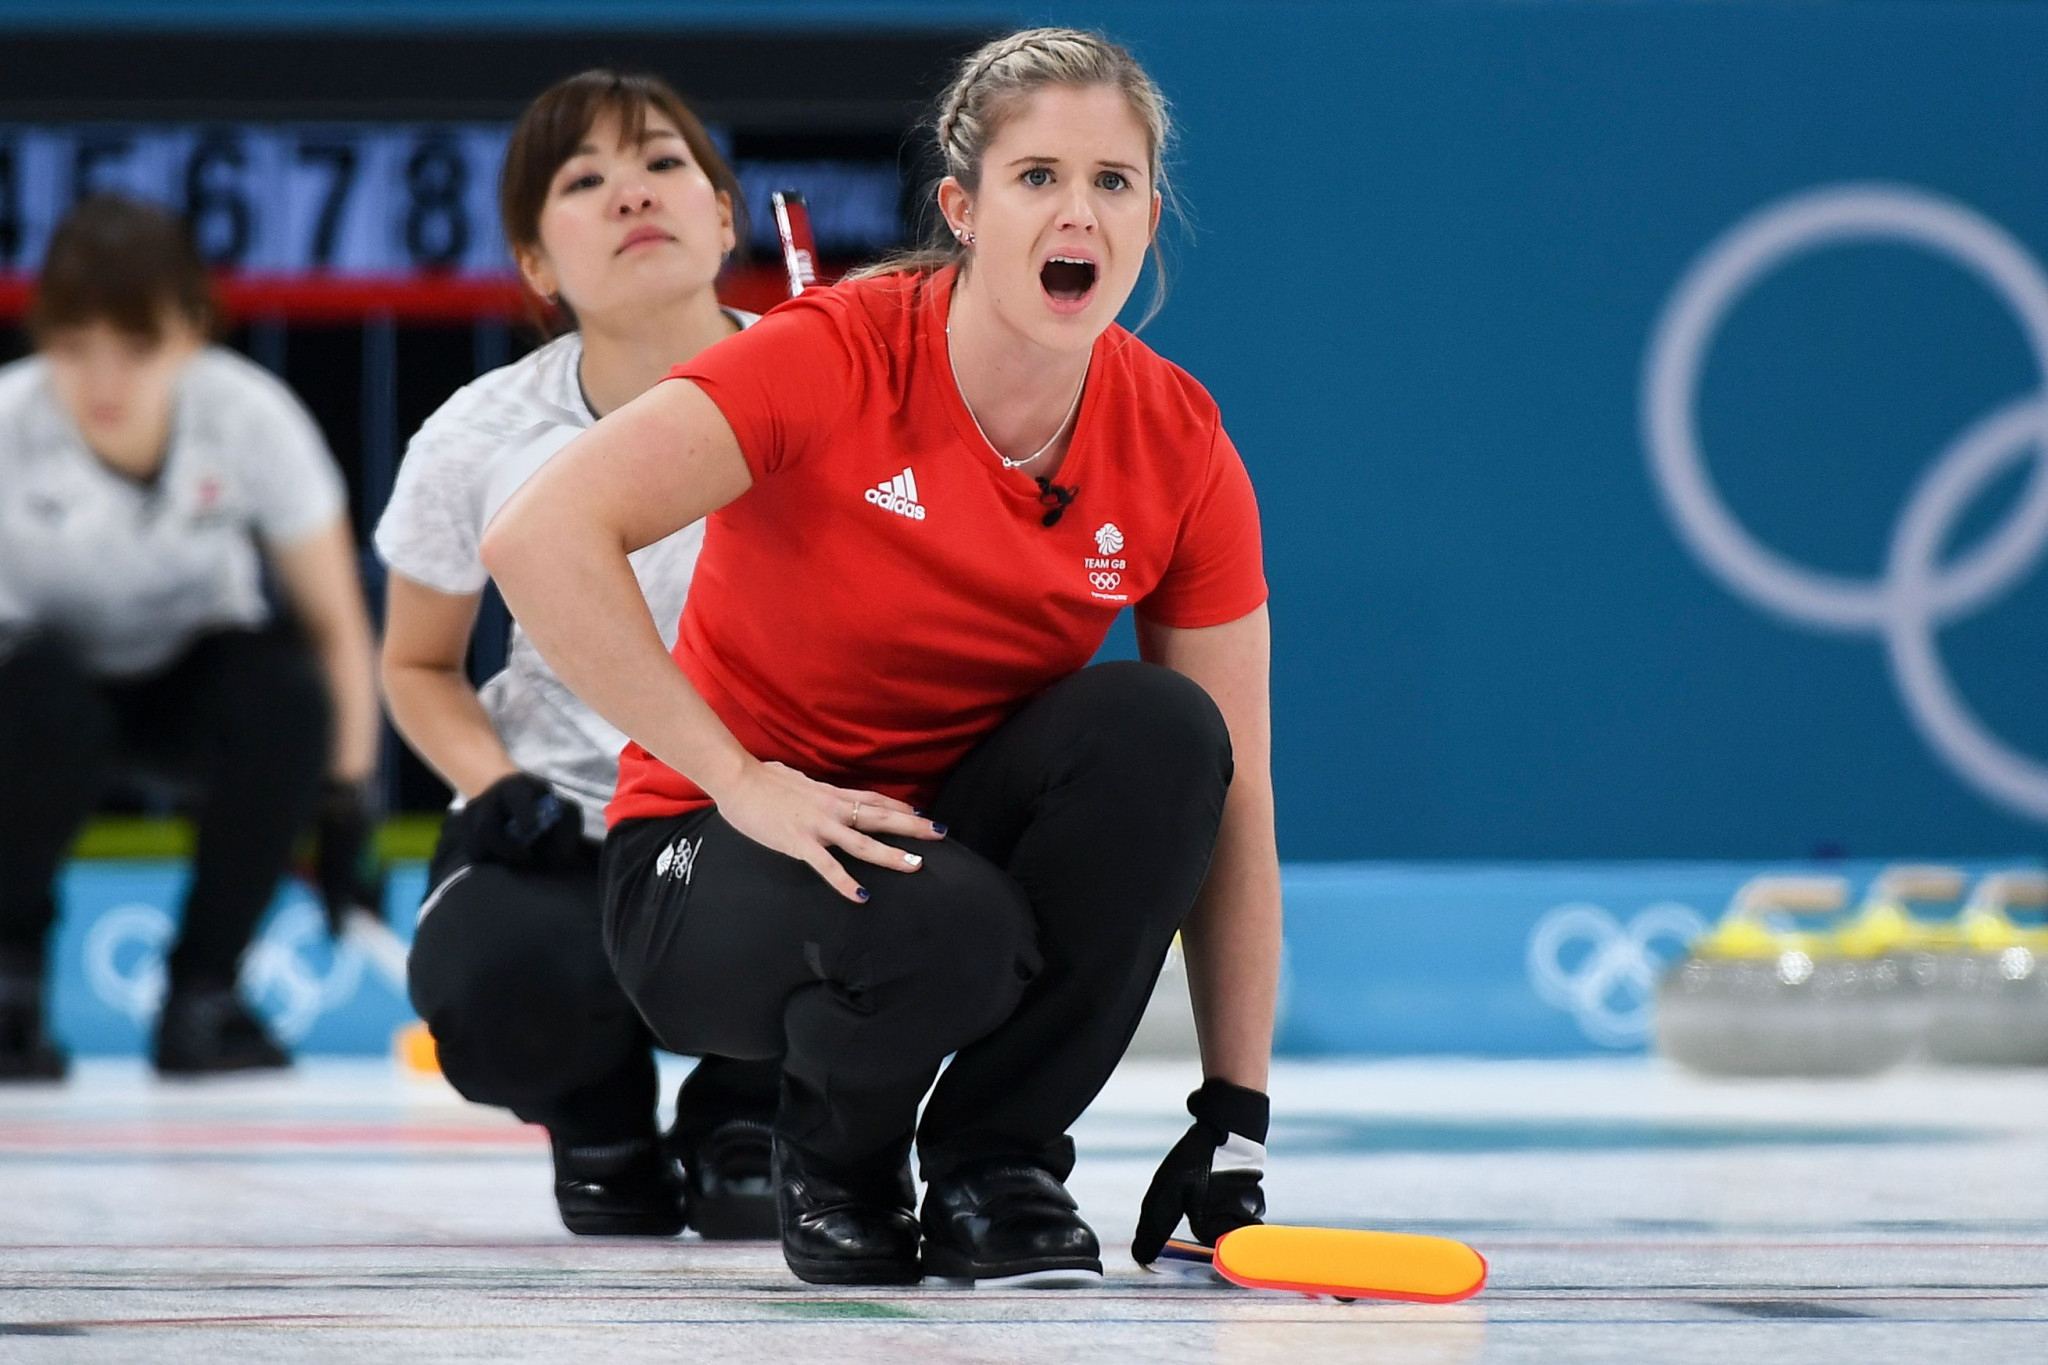 British Curling announces 2019-20 performance programme teams